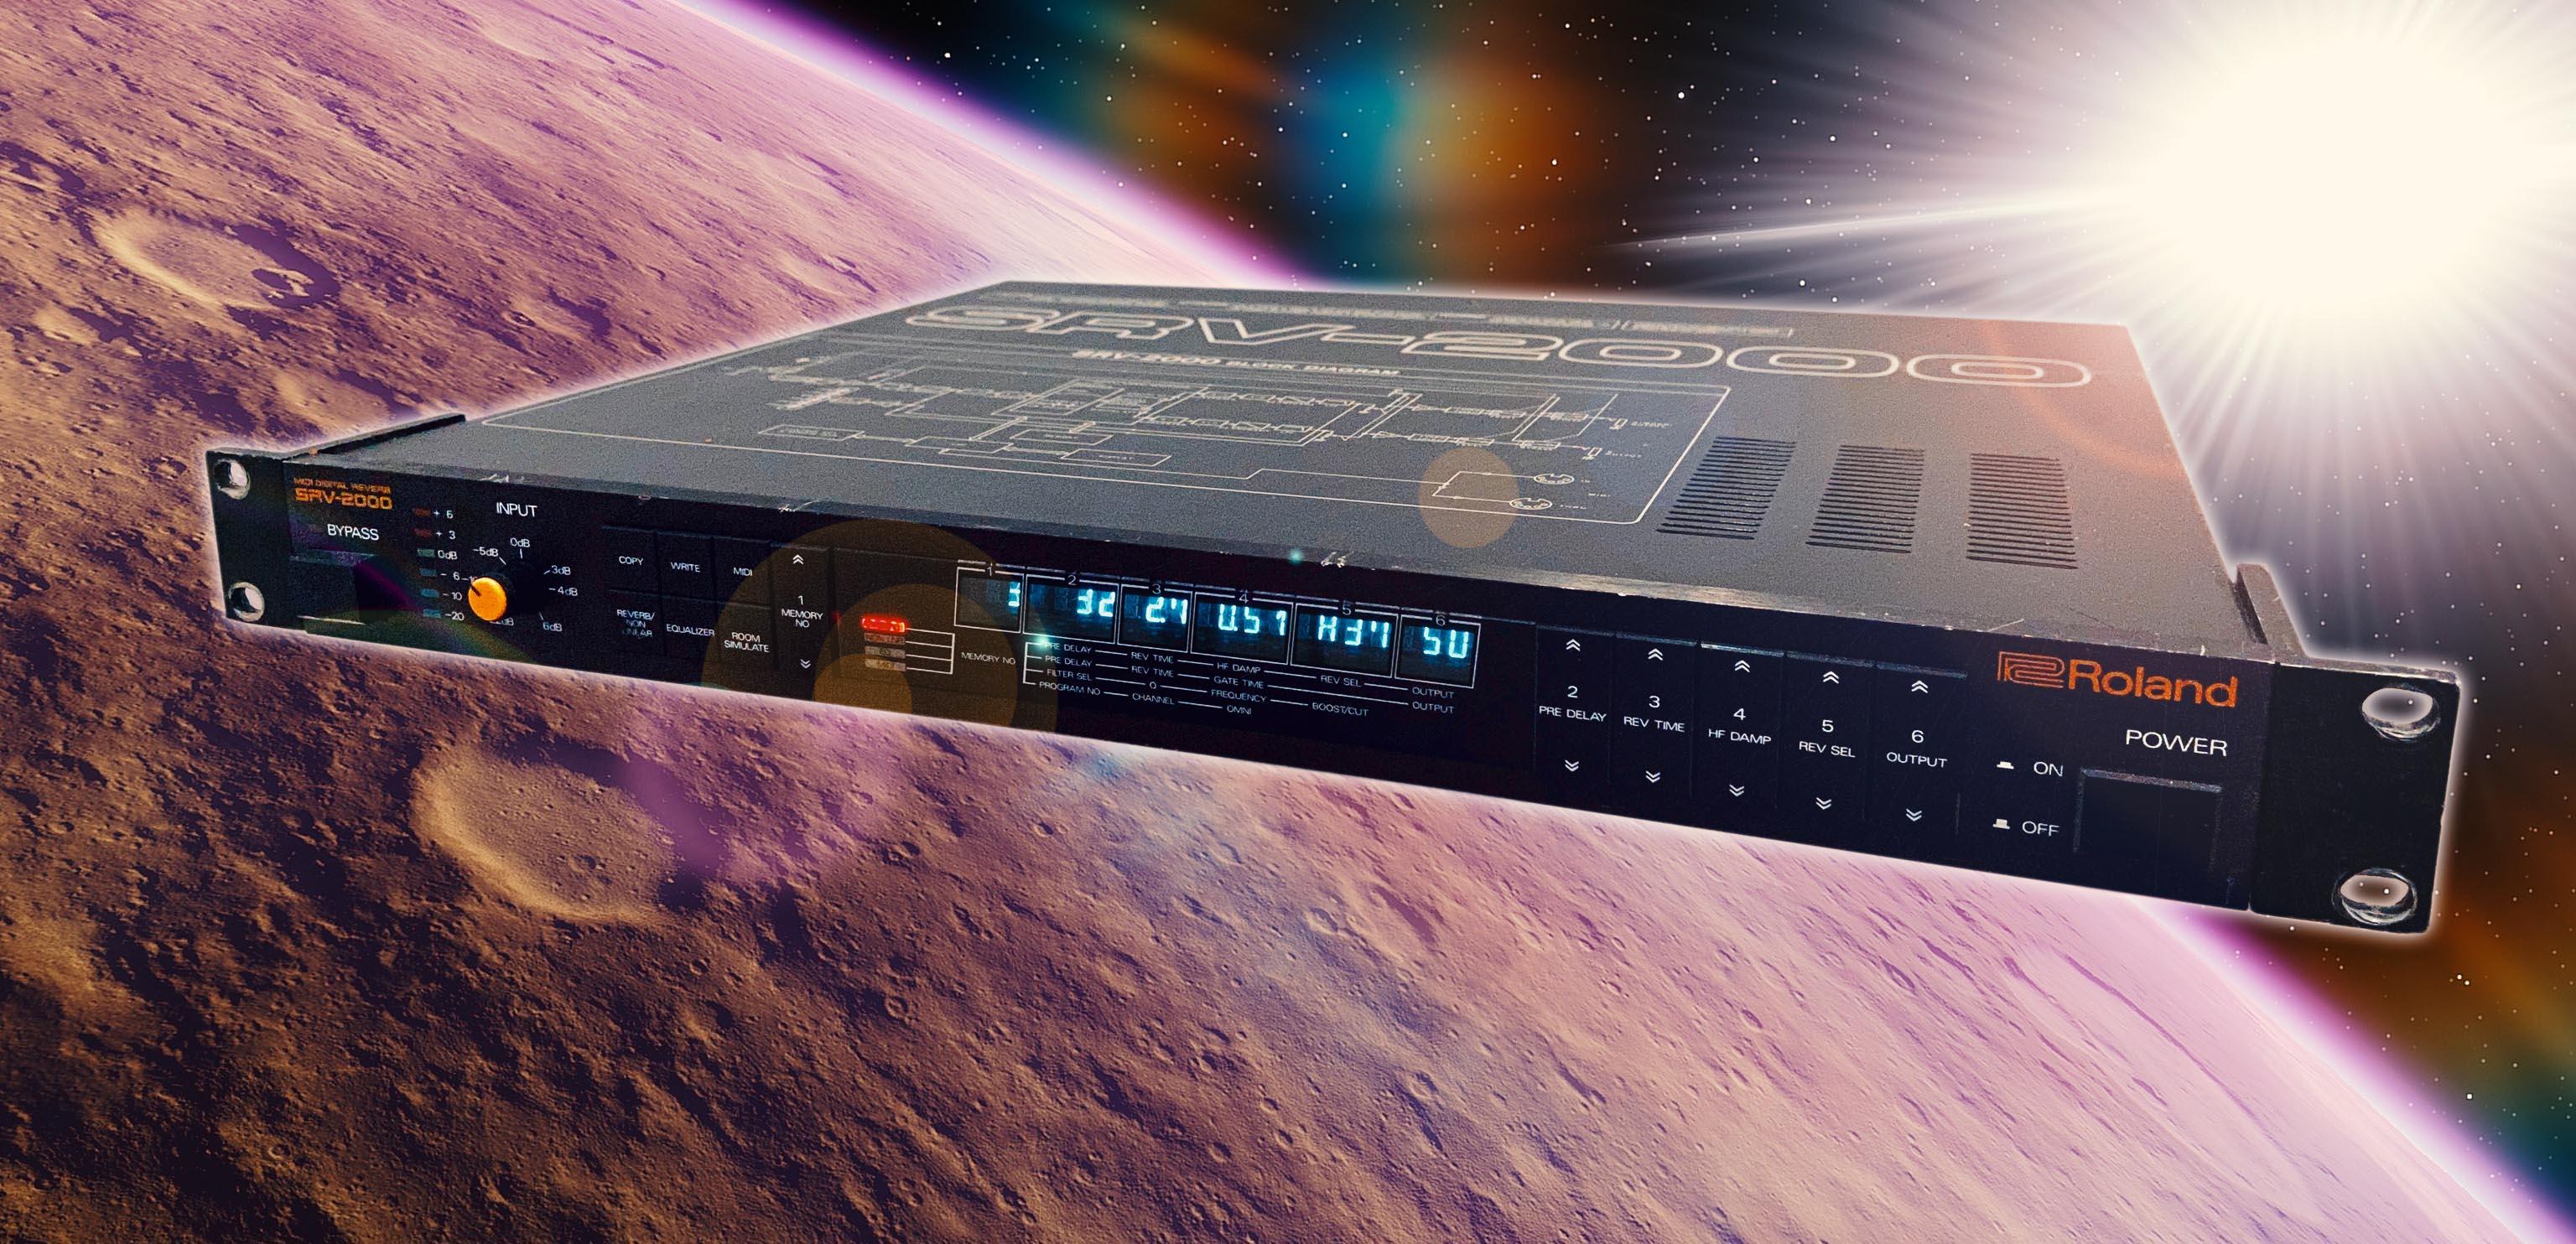 Roland SRV-2000